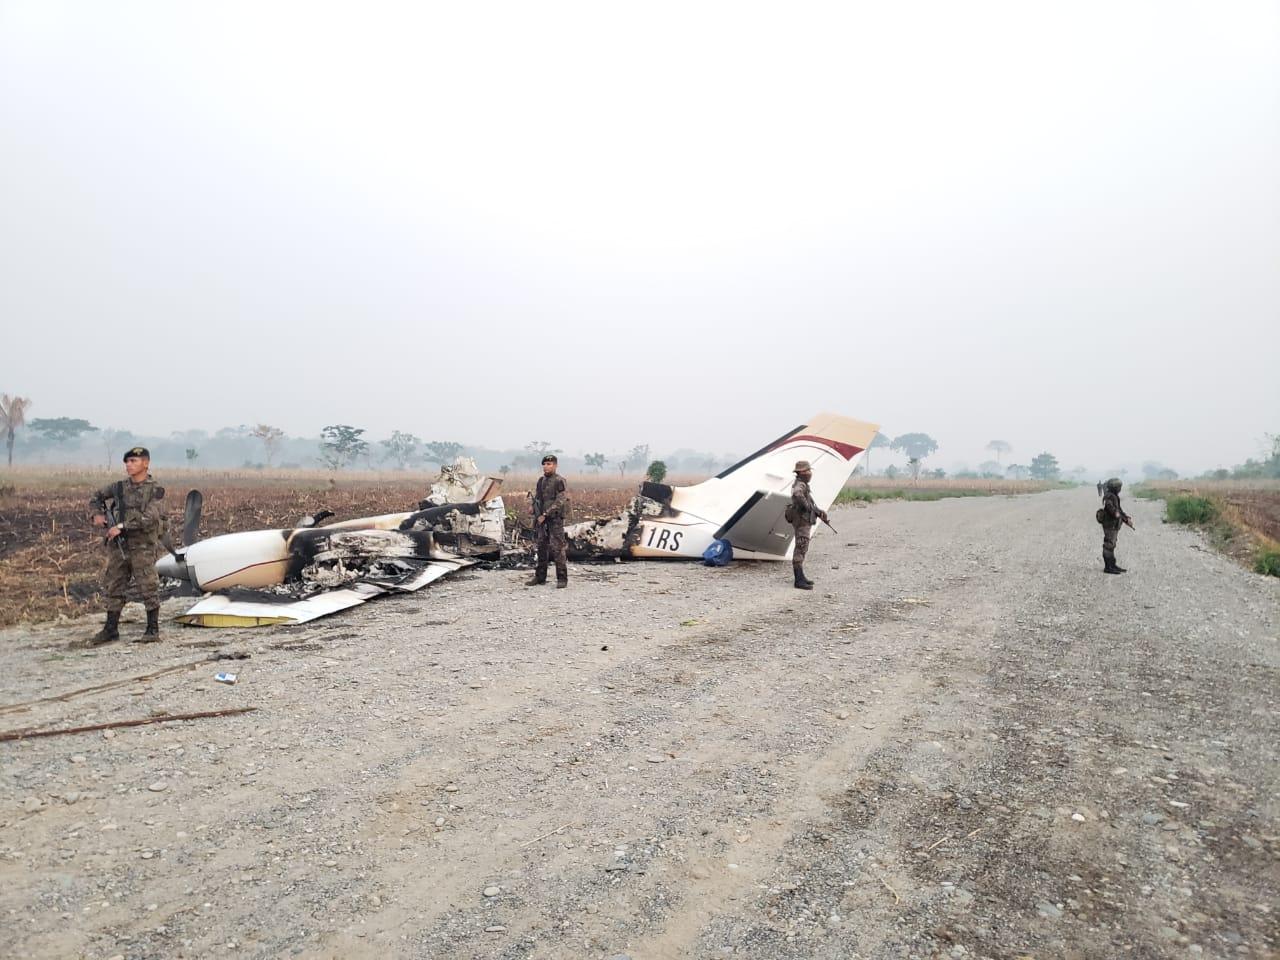 Avioneta incendiada en Alta Verapaz